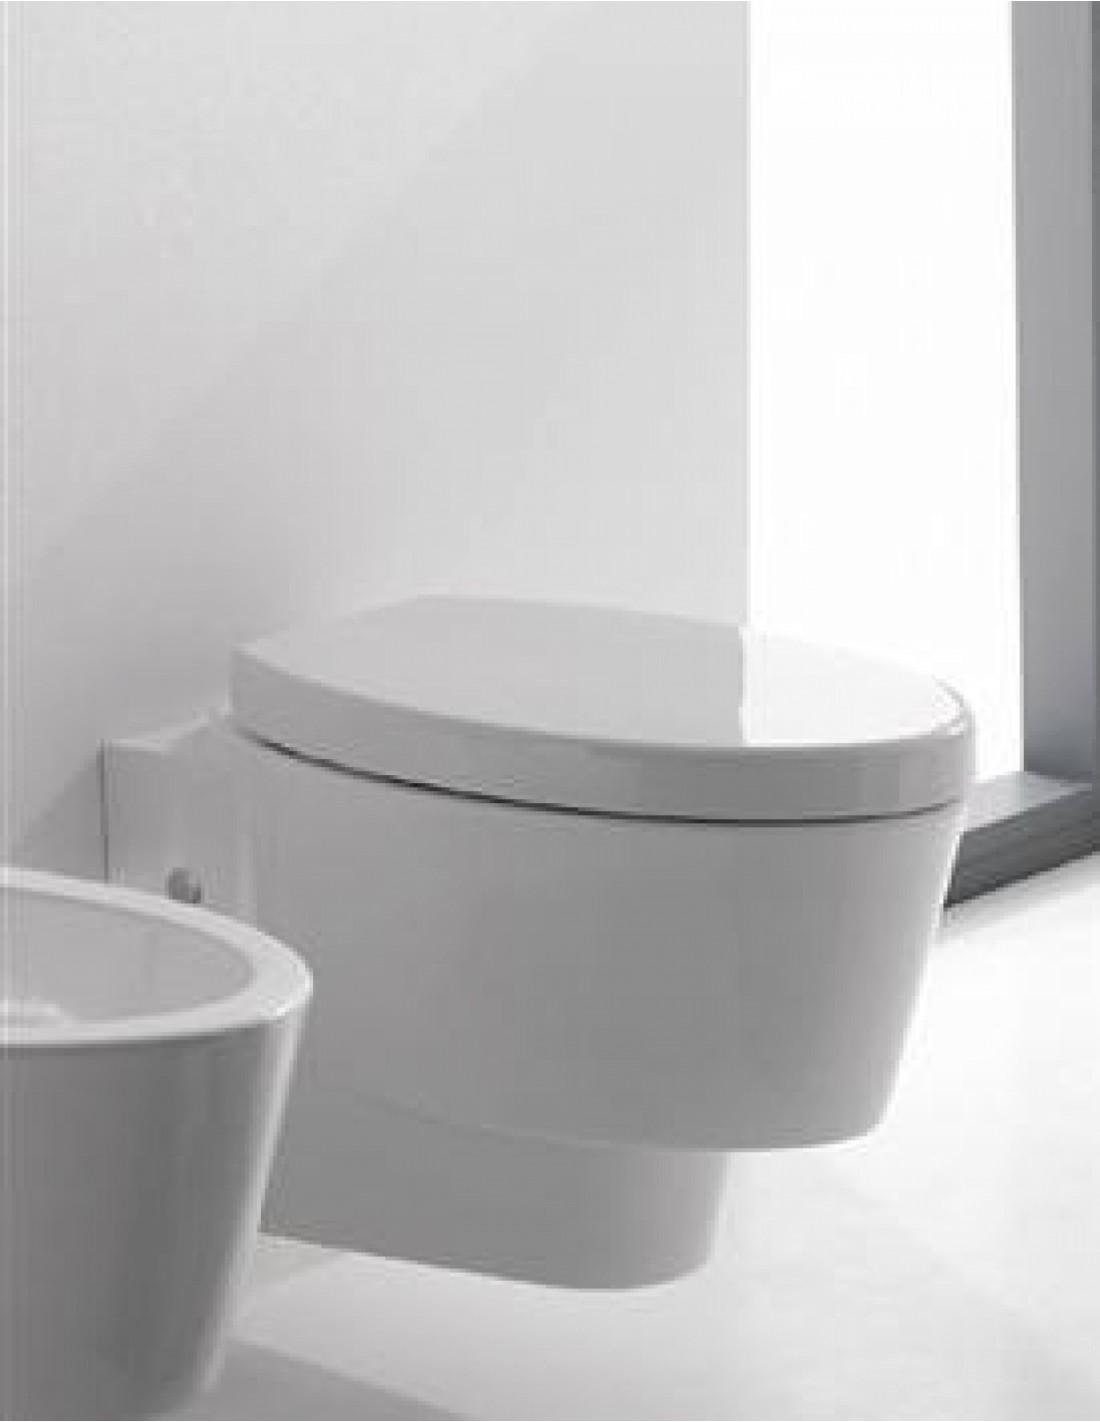 Wc Suspendu Couleur Gris Wici Next Handwash Sink In